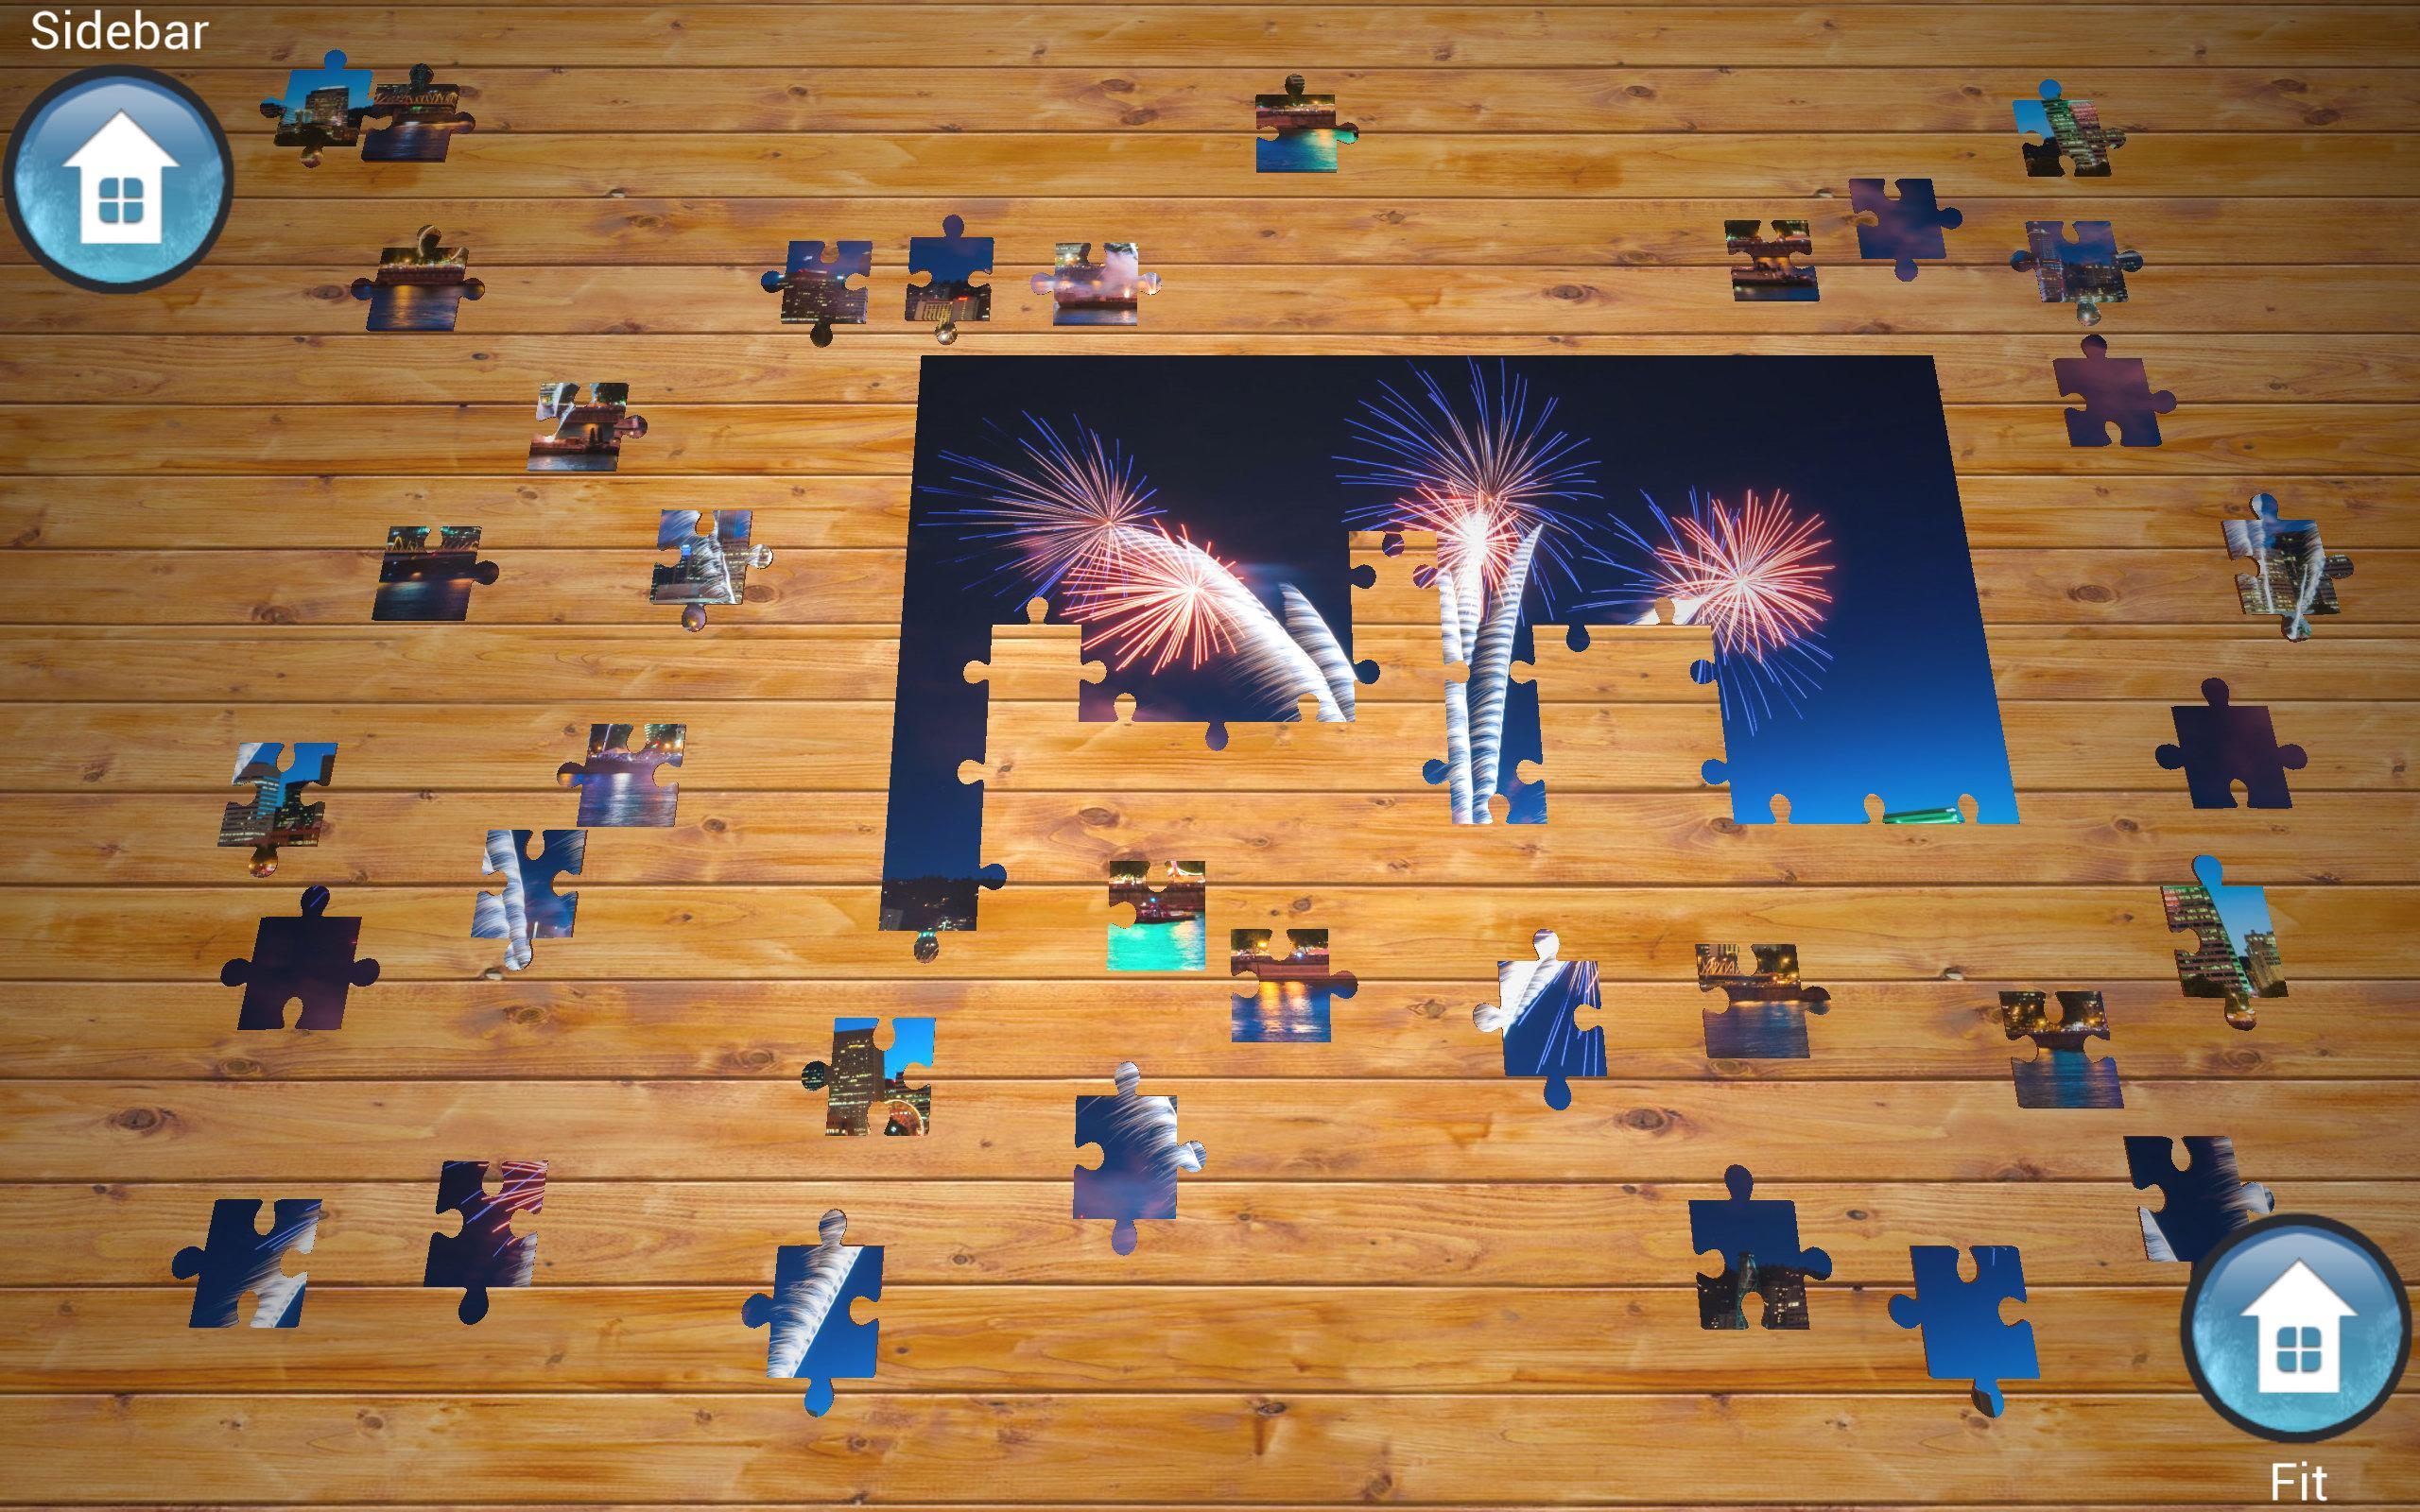 Linderdaum Jigsaw Puzzle | Mobile Development